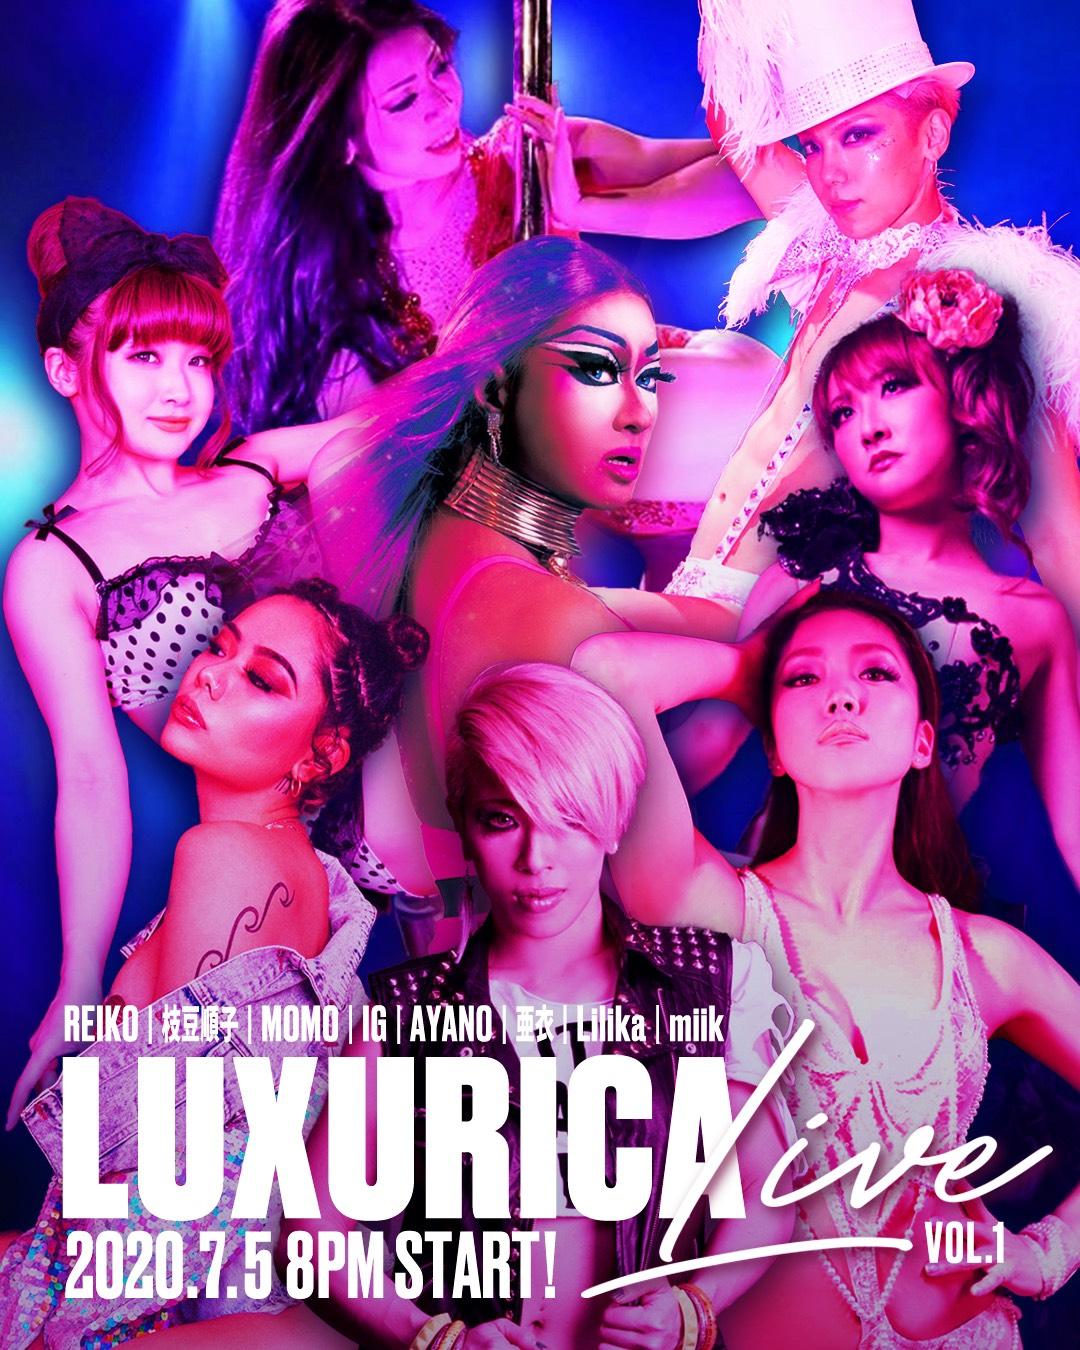 LUXURICA LIVE vol.1 〜無観客!!ポールダンスライブ配信showイベント〜